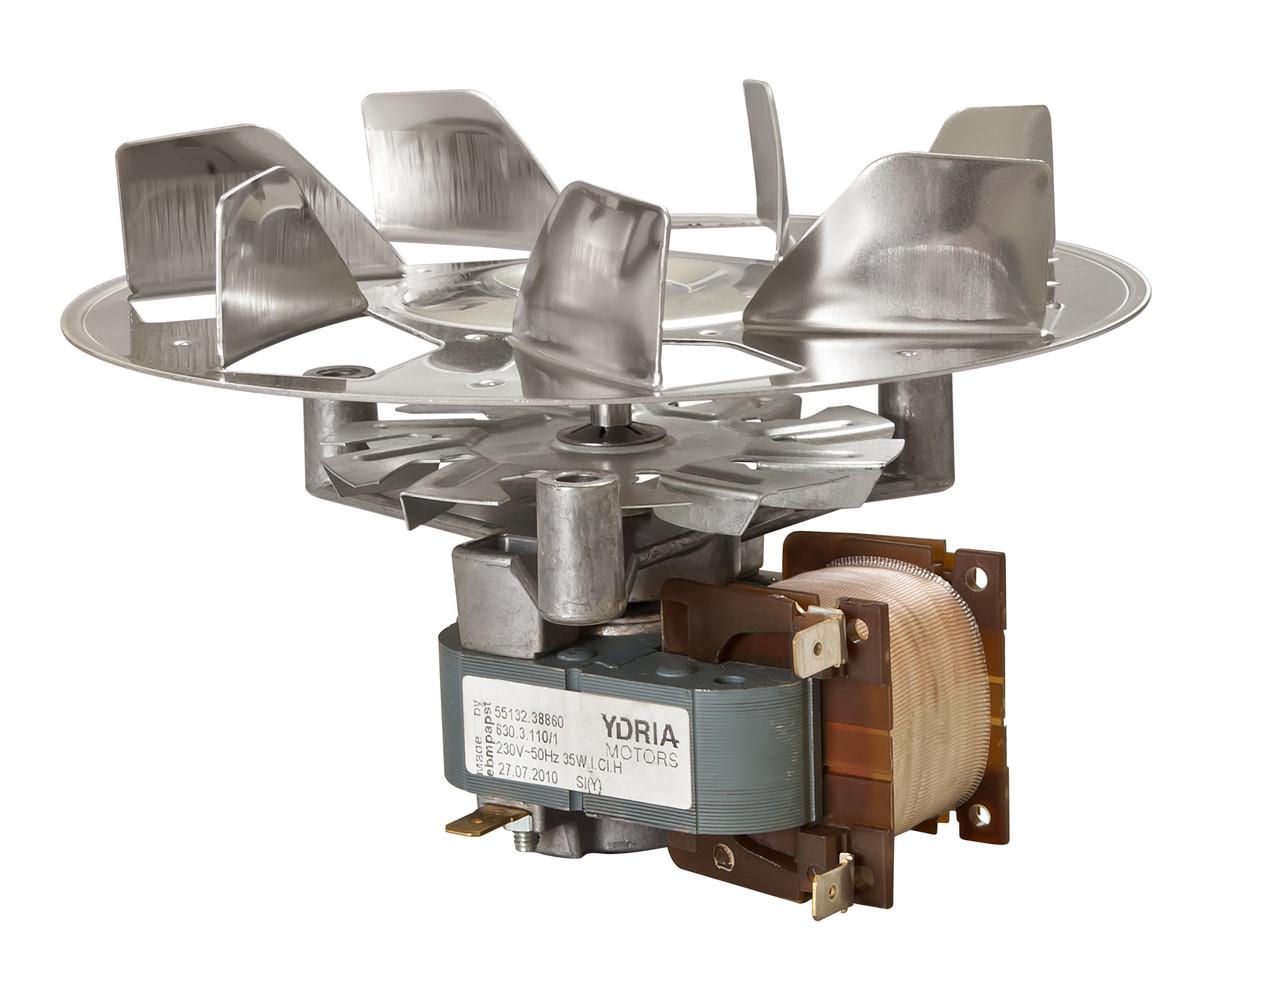 Вентилятор 36990 для плит Kogast ES, ESK, KSP